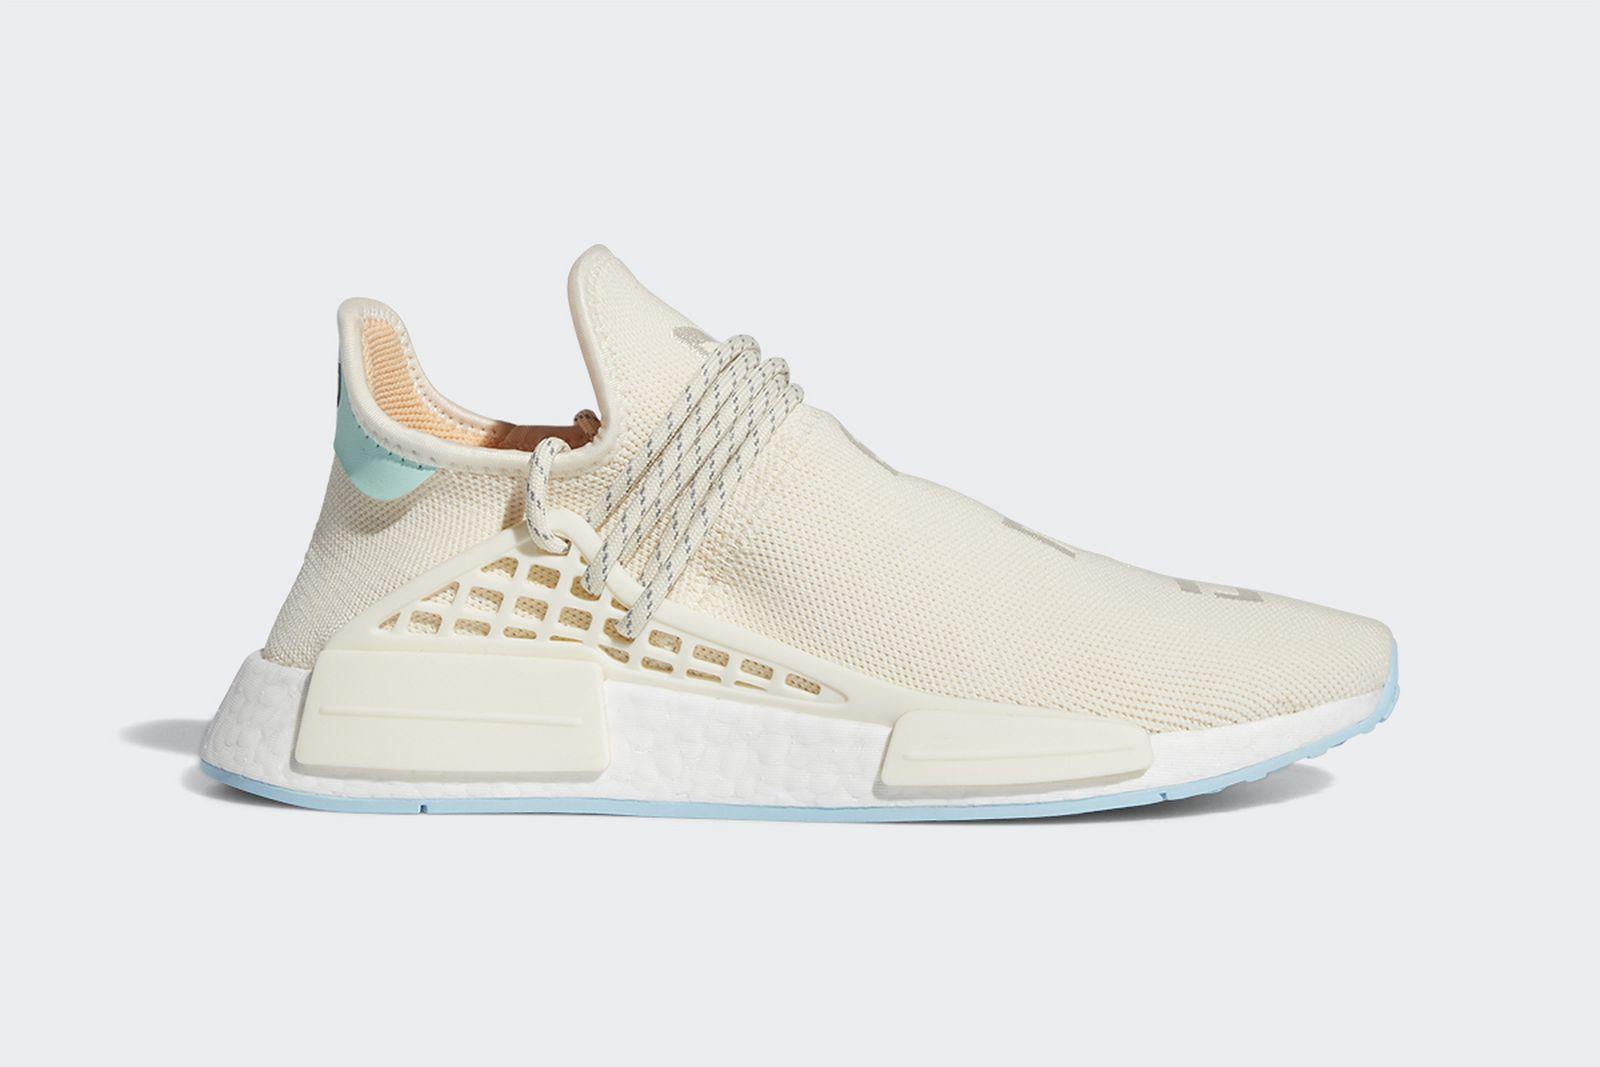 nerd-adidas-nmd-hu-release-date-price-1-01